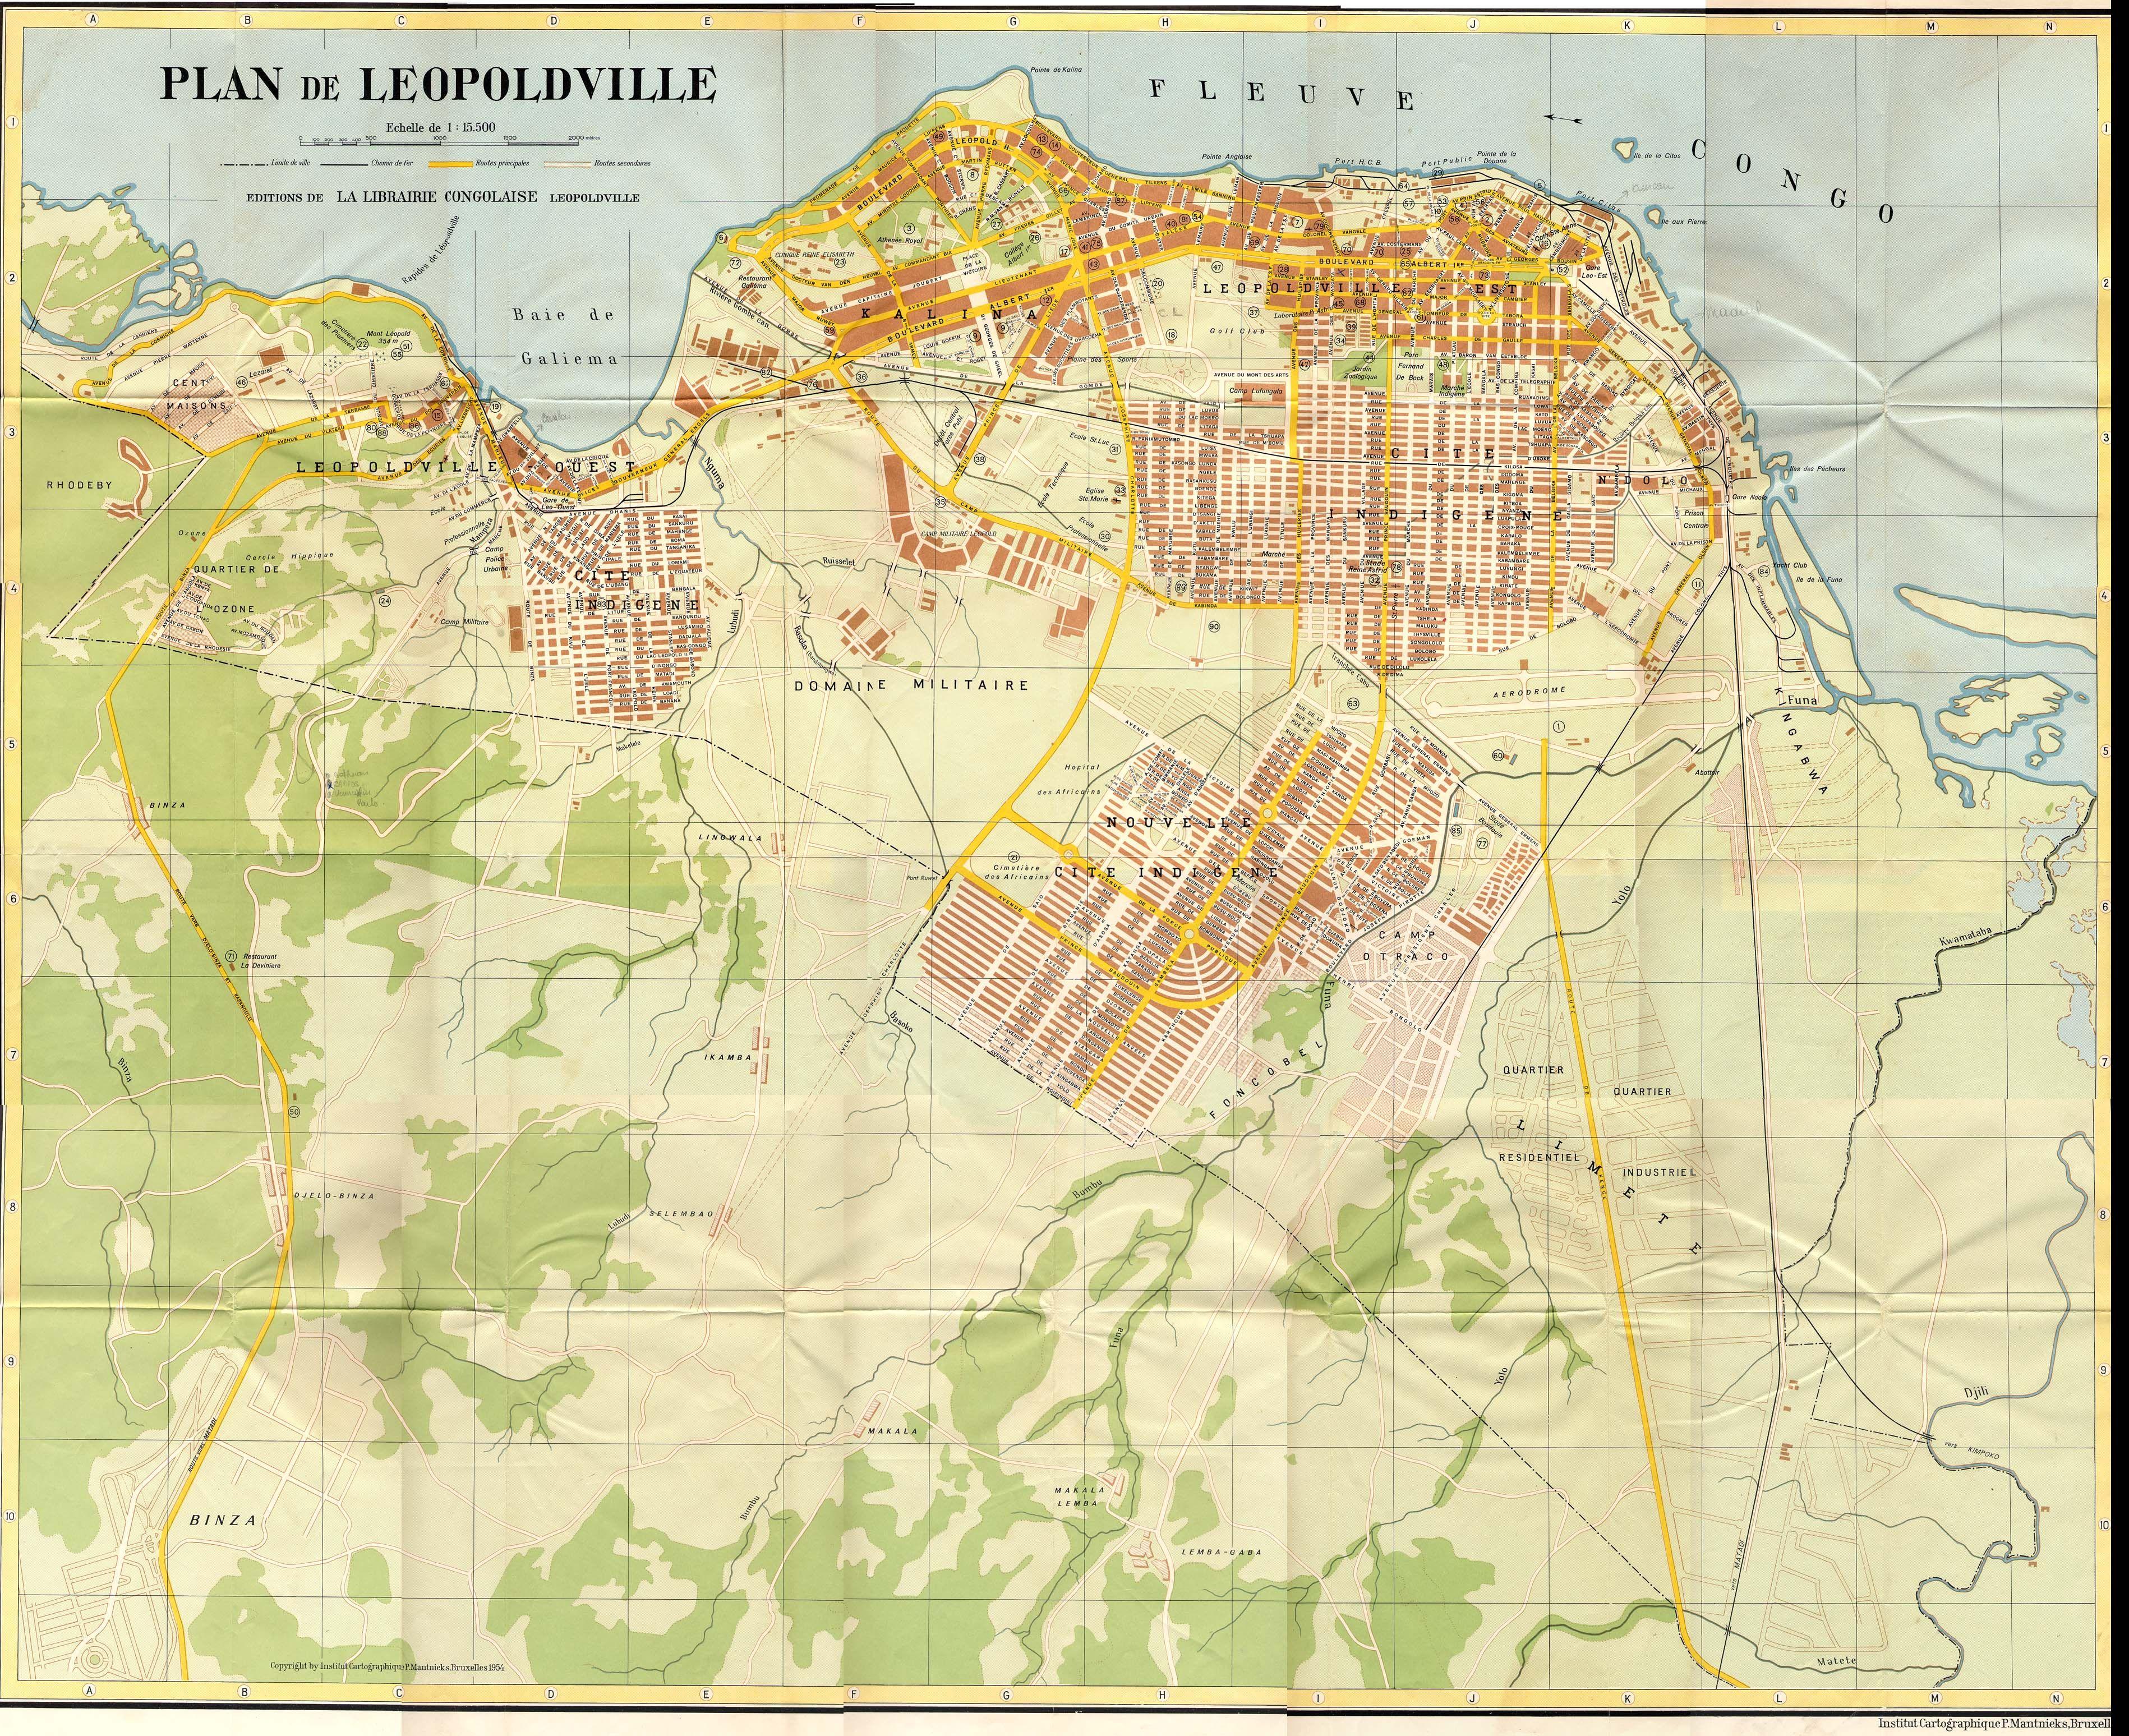 Map of Leopoldville Kinshasa 1960  Mappings  Pinterest